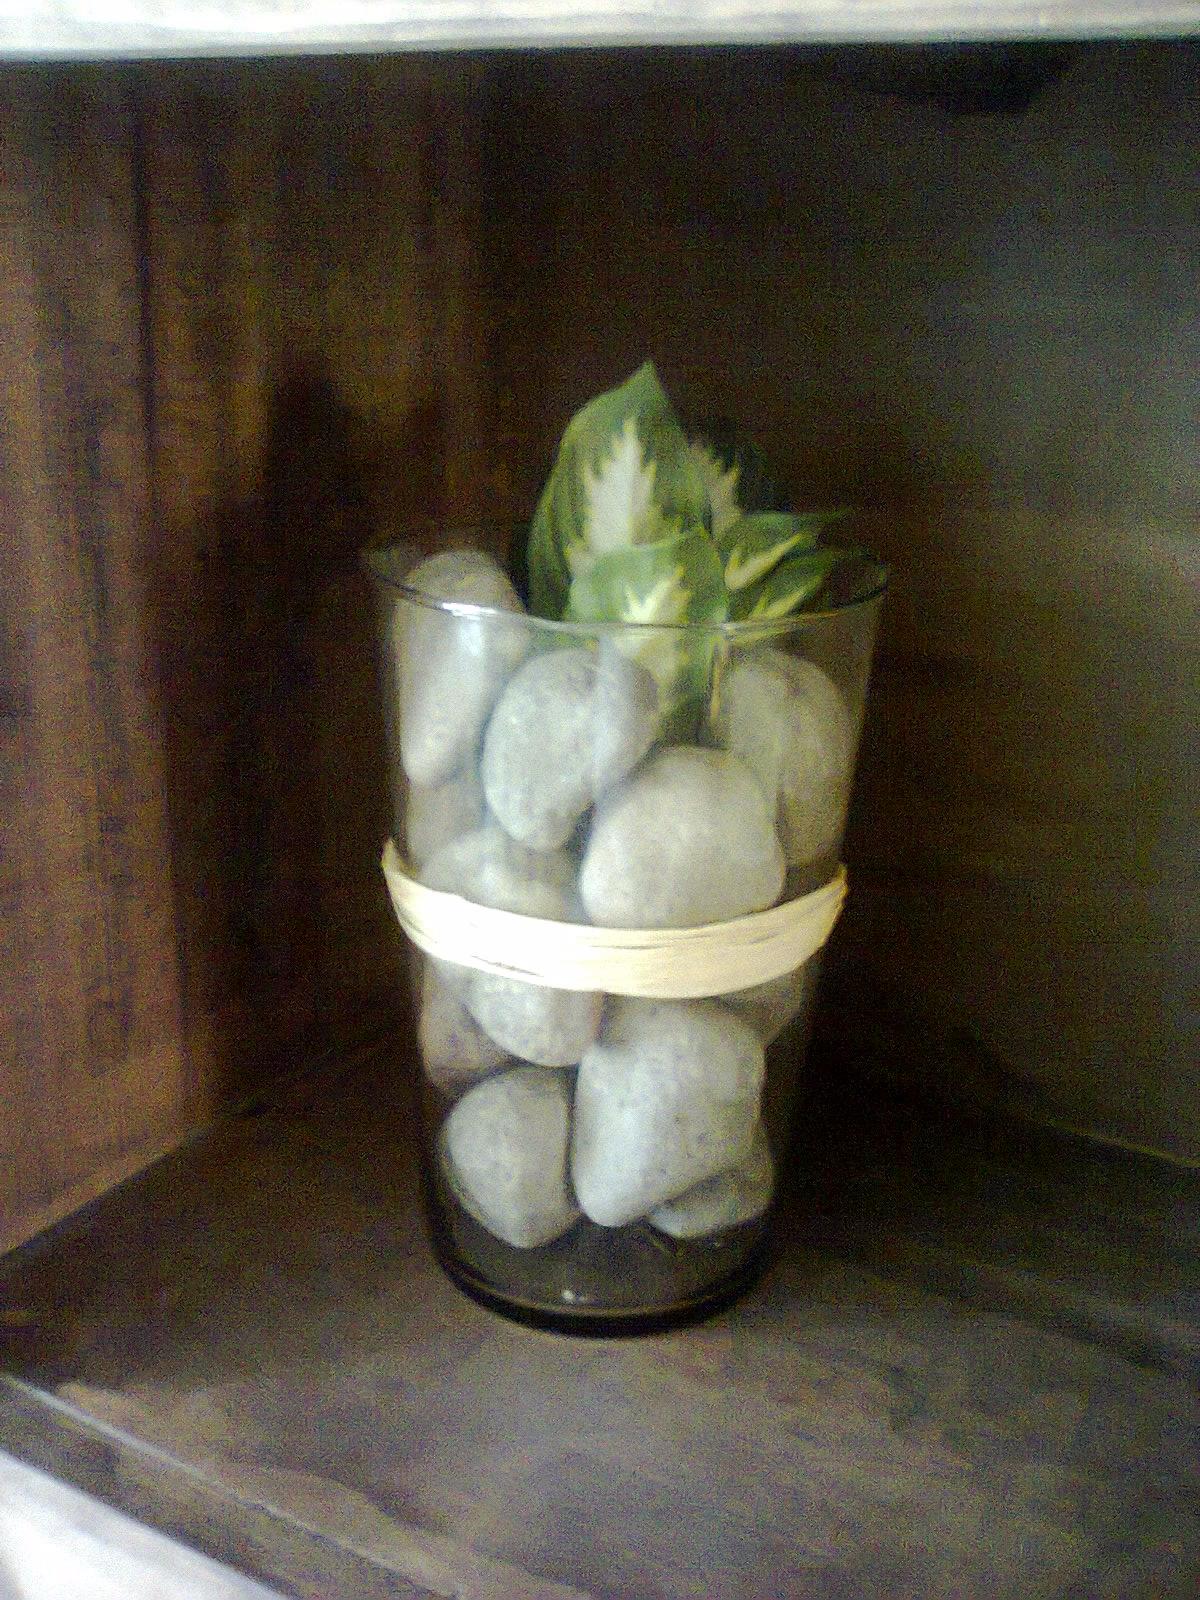 Cositis adornos con piedras de rio for Piedras de rio para decoracion